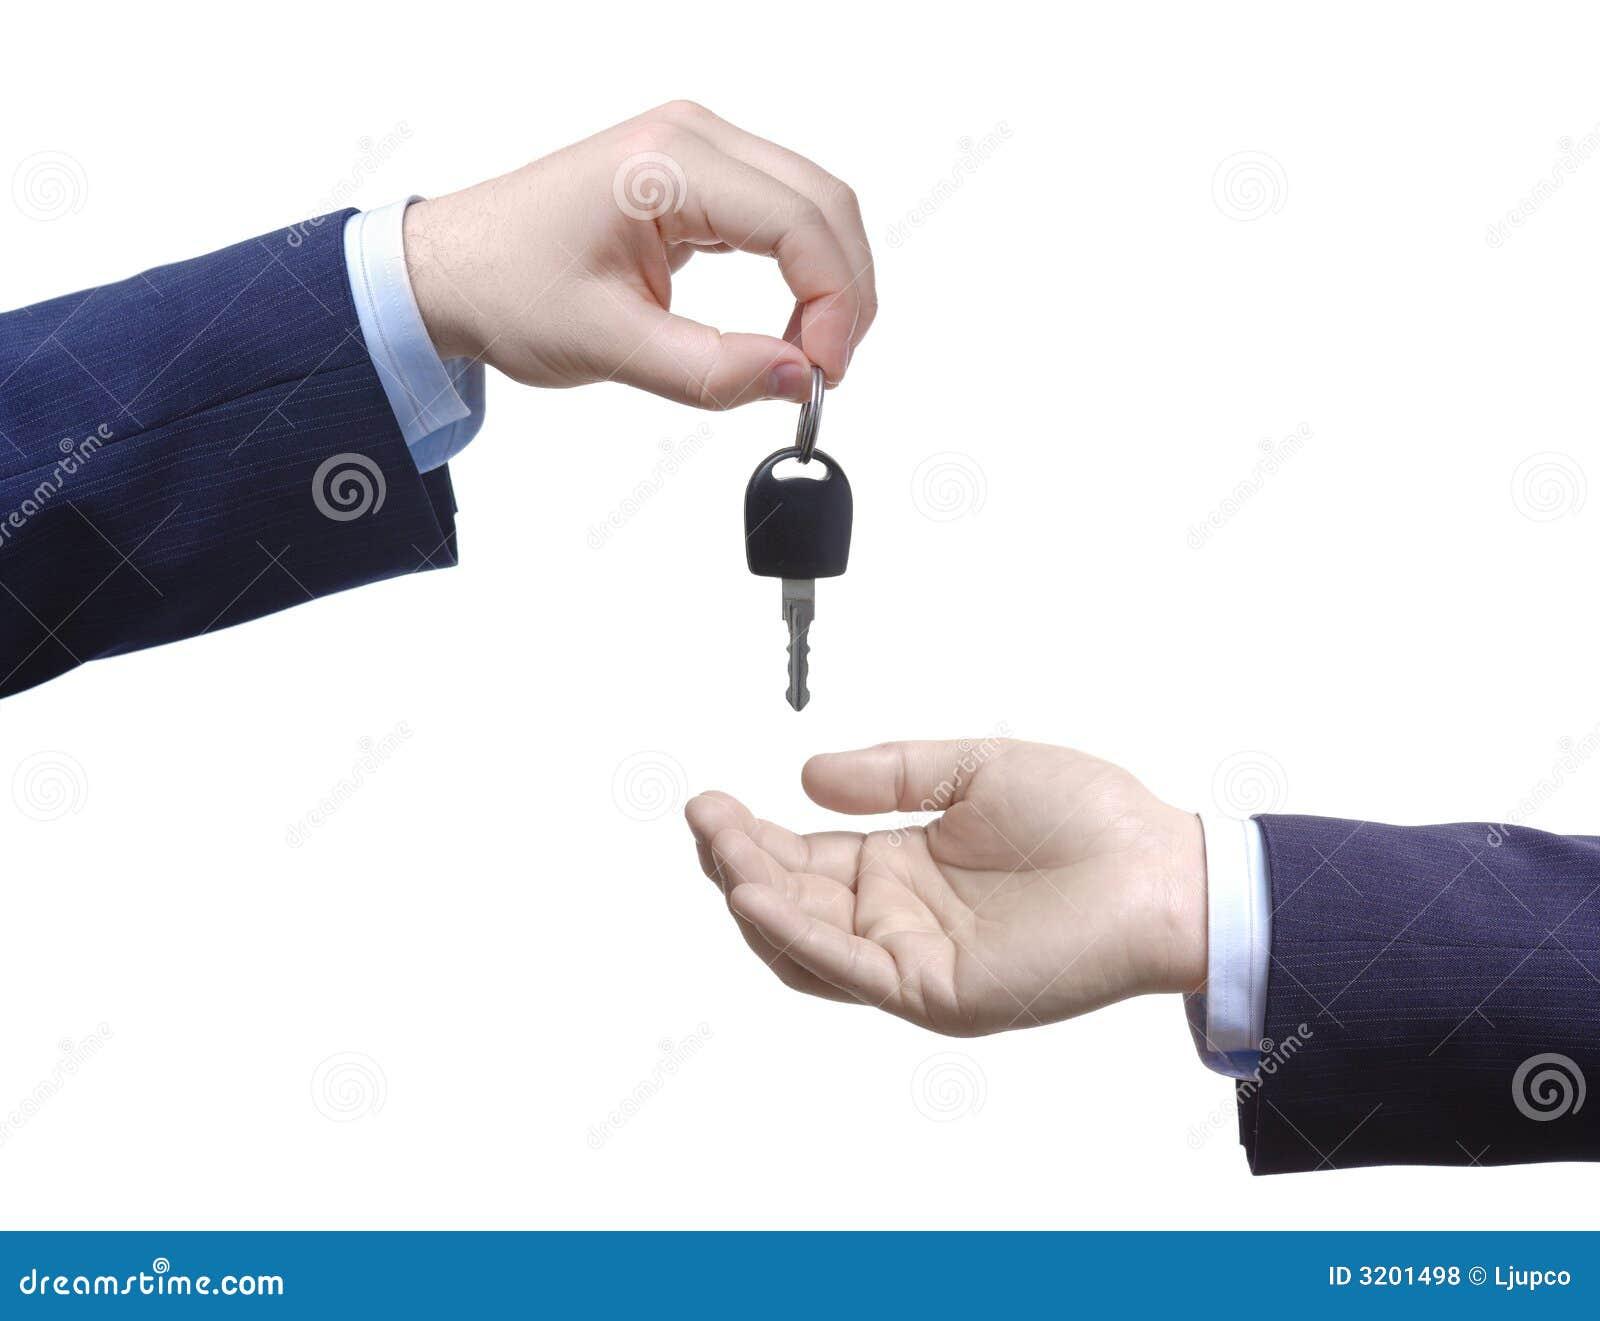 Person passing car keys